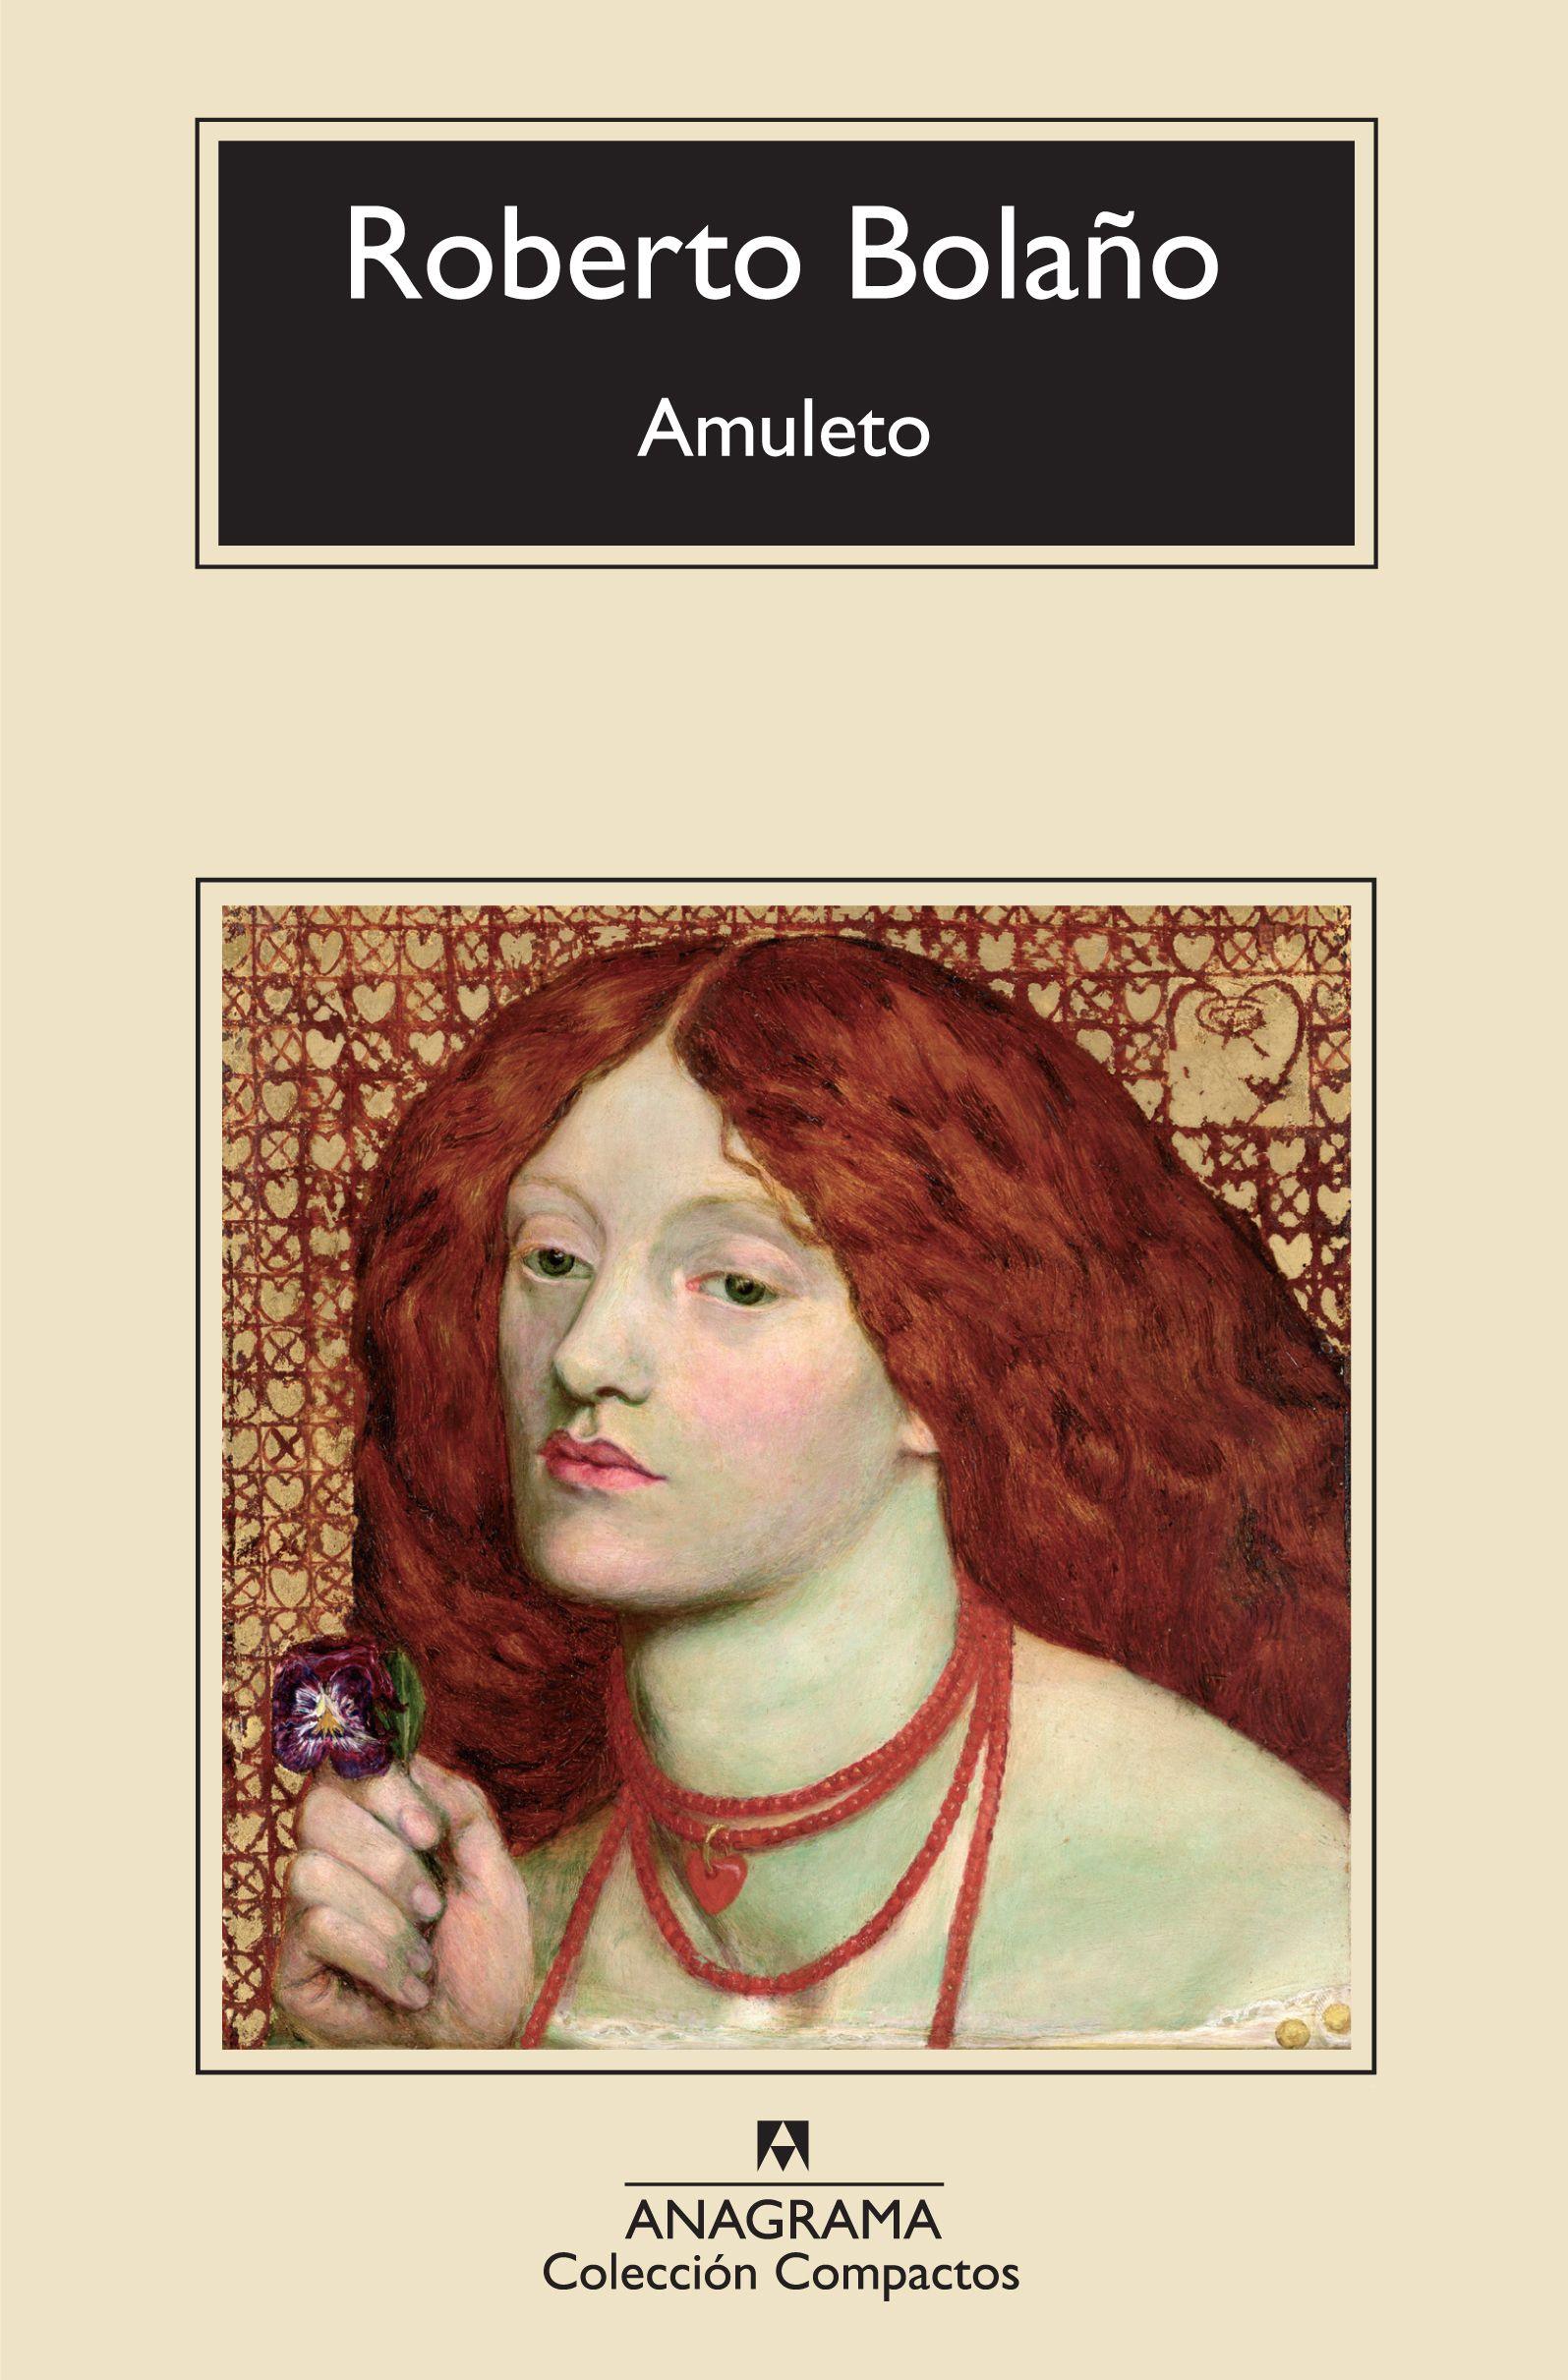 Amuleto - Bolaño, Roberto - 978-84-339-7355-9 - Editorial Anagrama